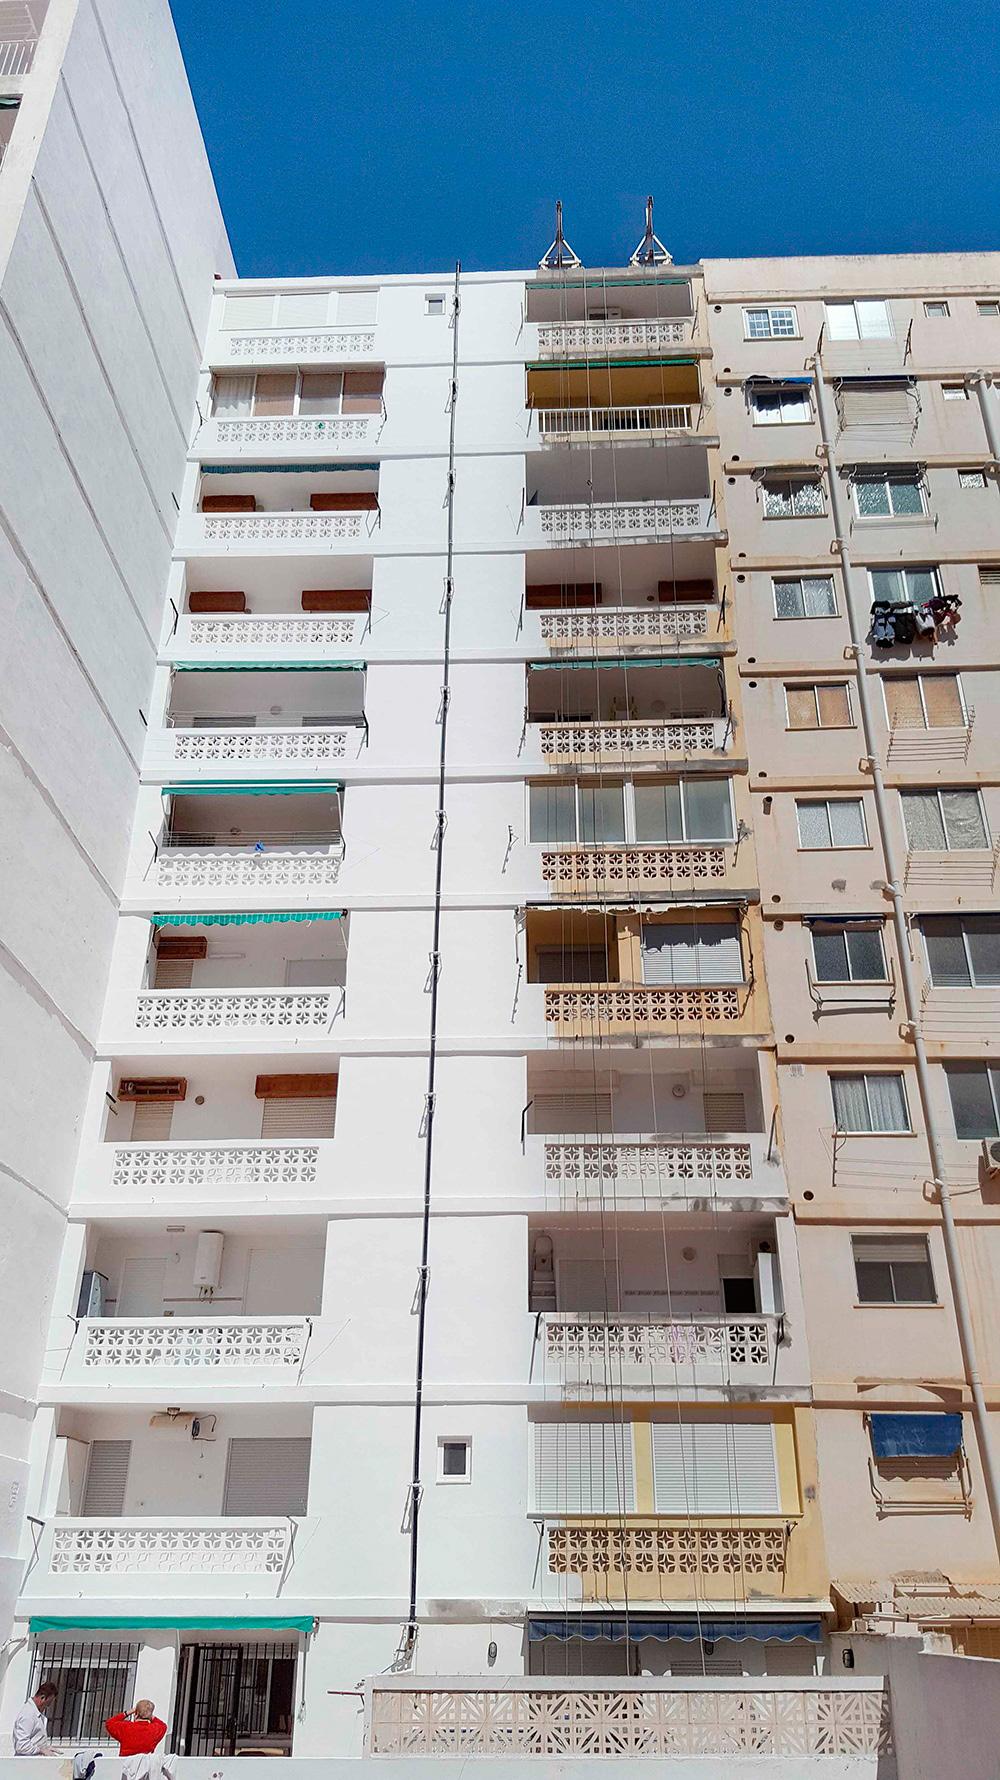 2_fachada_edificio_ancla